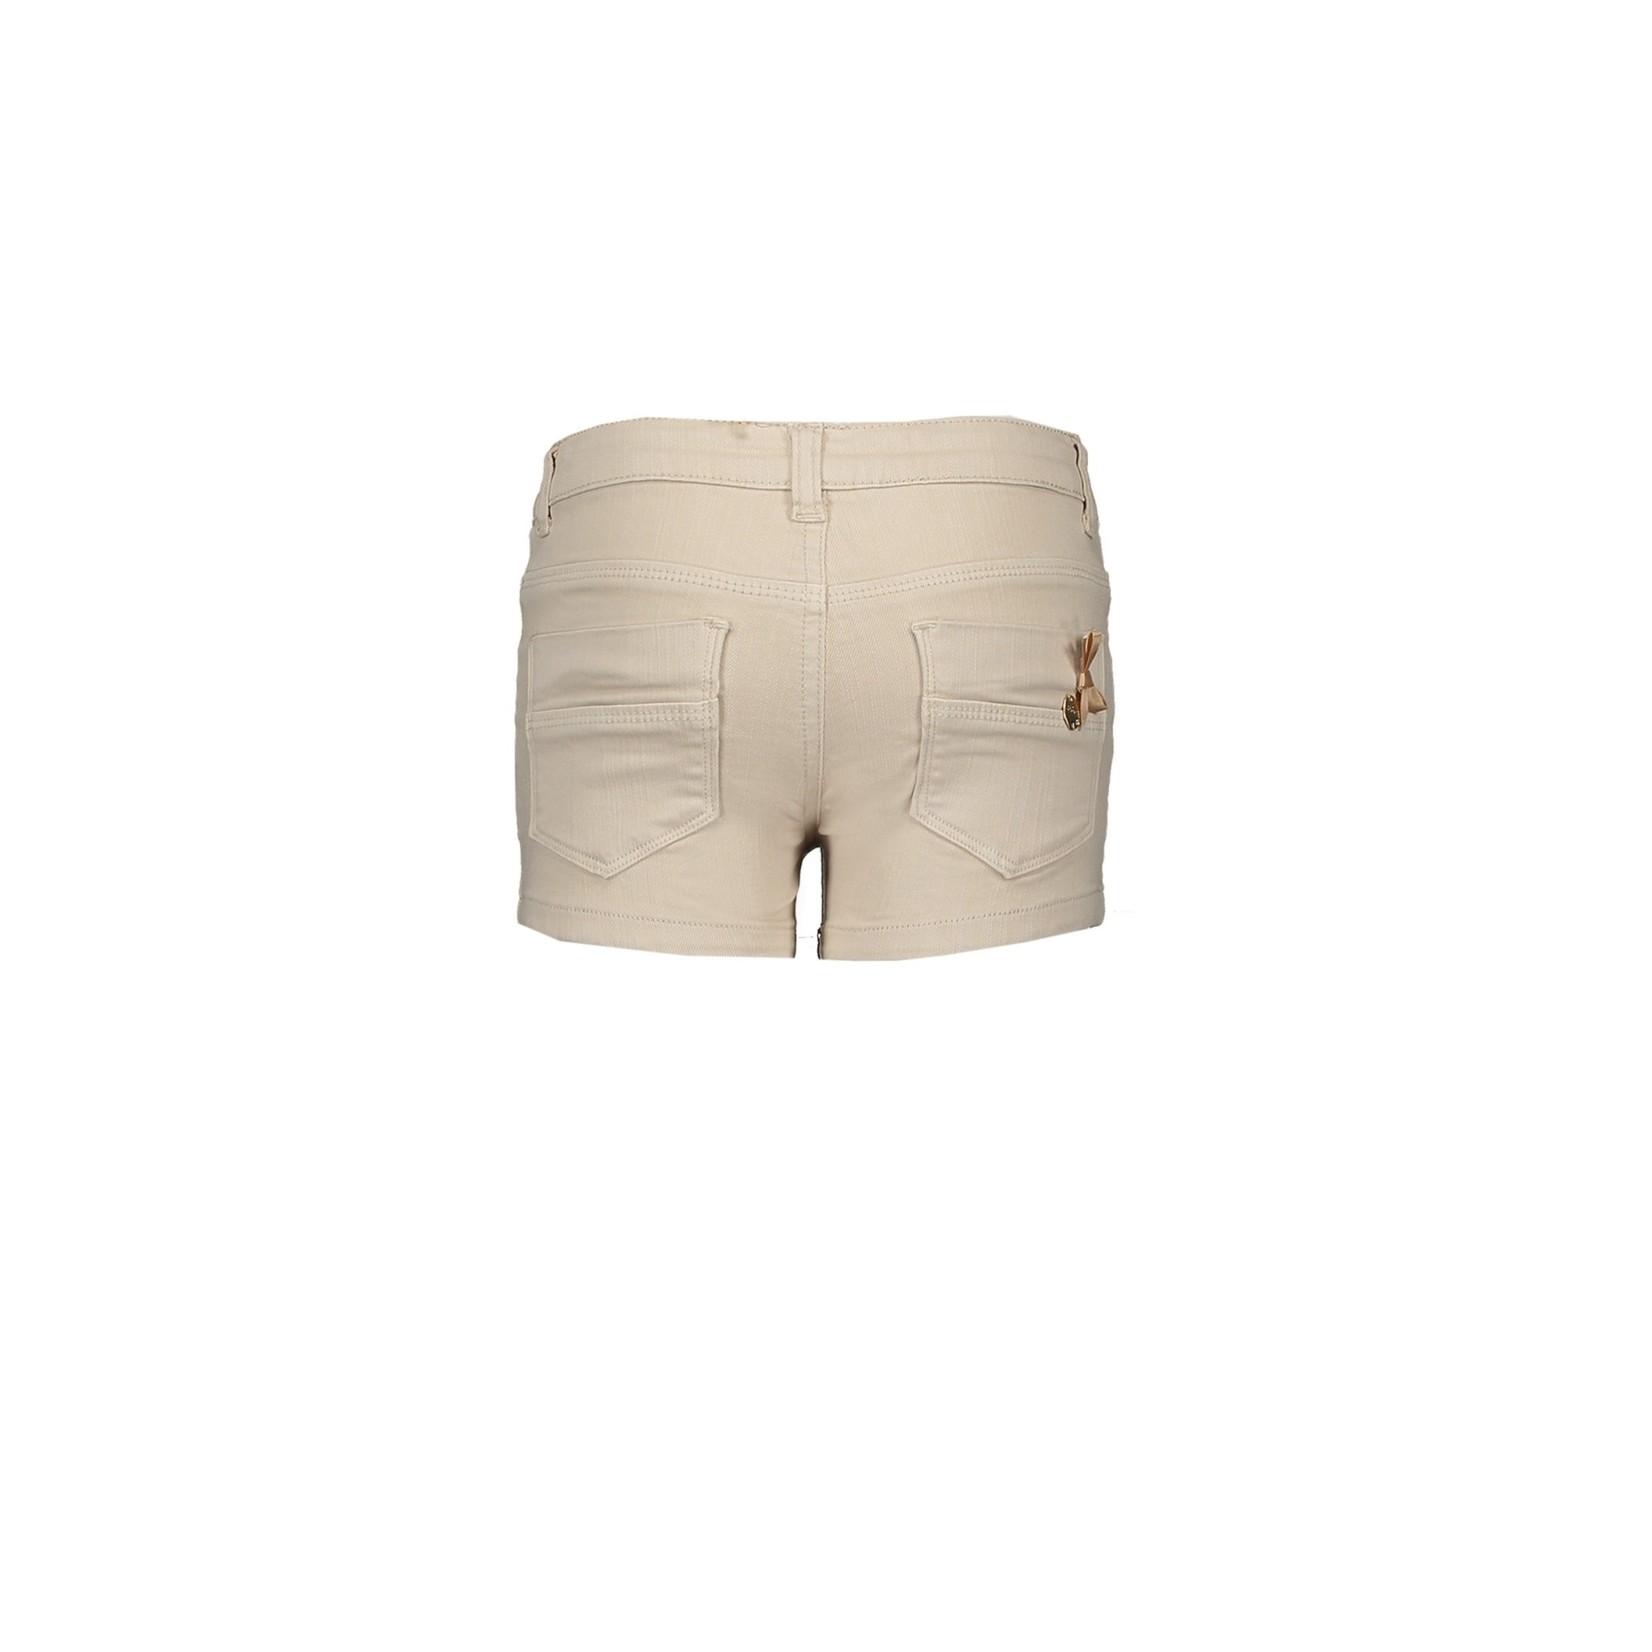 Le chic denim shorts studs & pearls